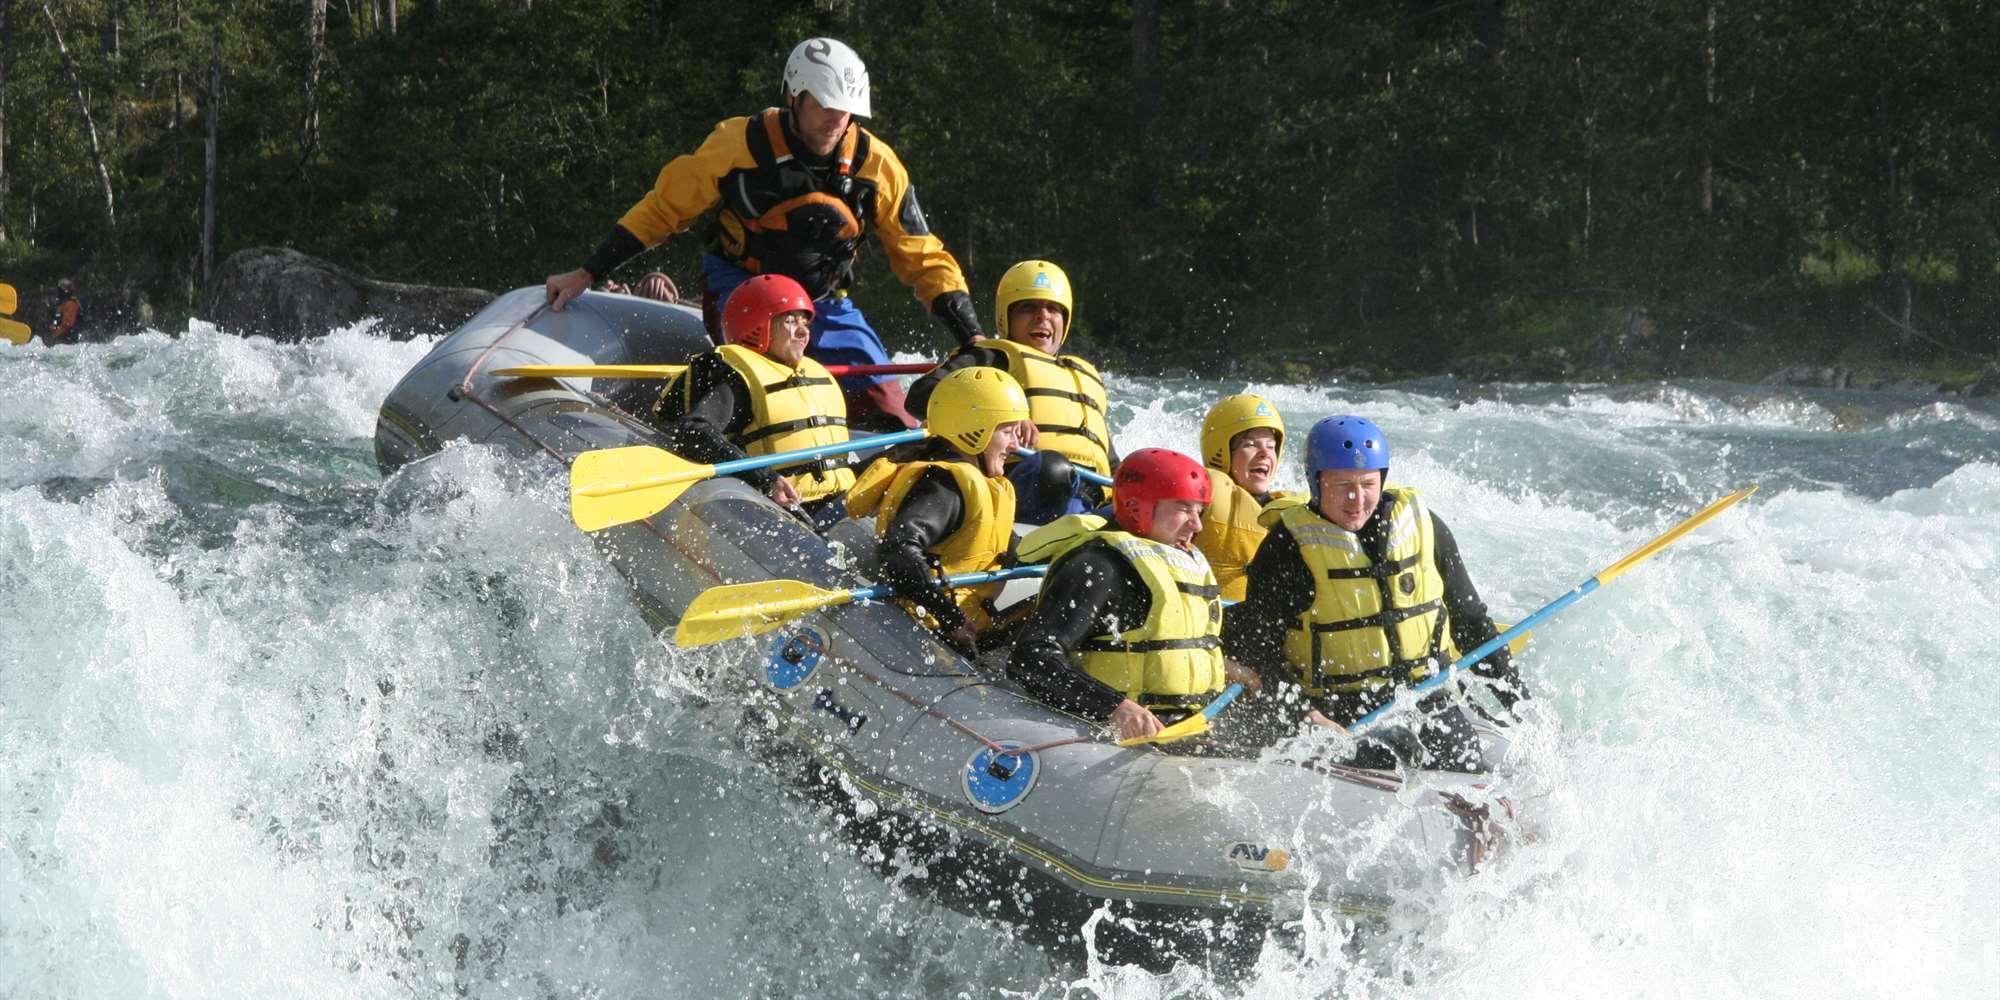 round trip train ride and rafting visitbergen com